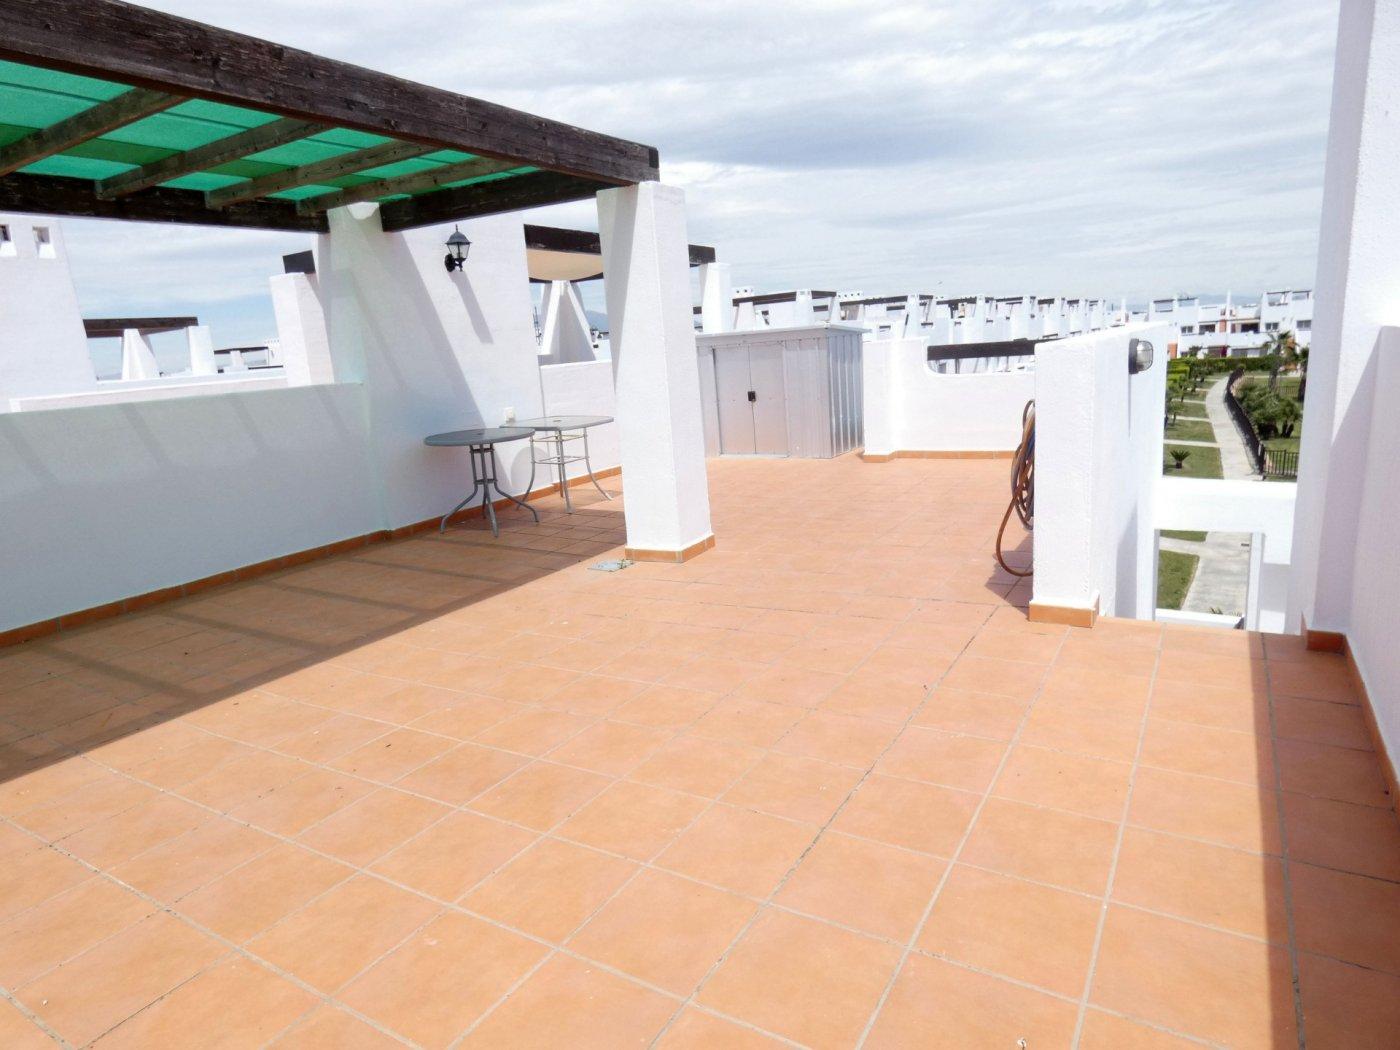 Gallery Image 26 of Key-Ready 2 Bedroom Apartment Overlooking the Citrus Groves in Jardin 10, Condado de Alhama